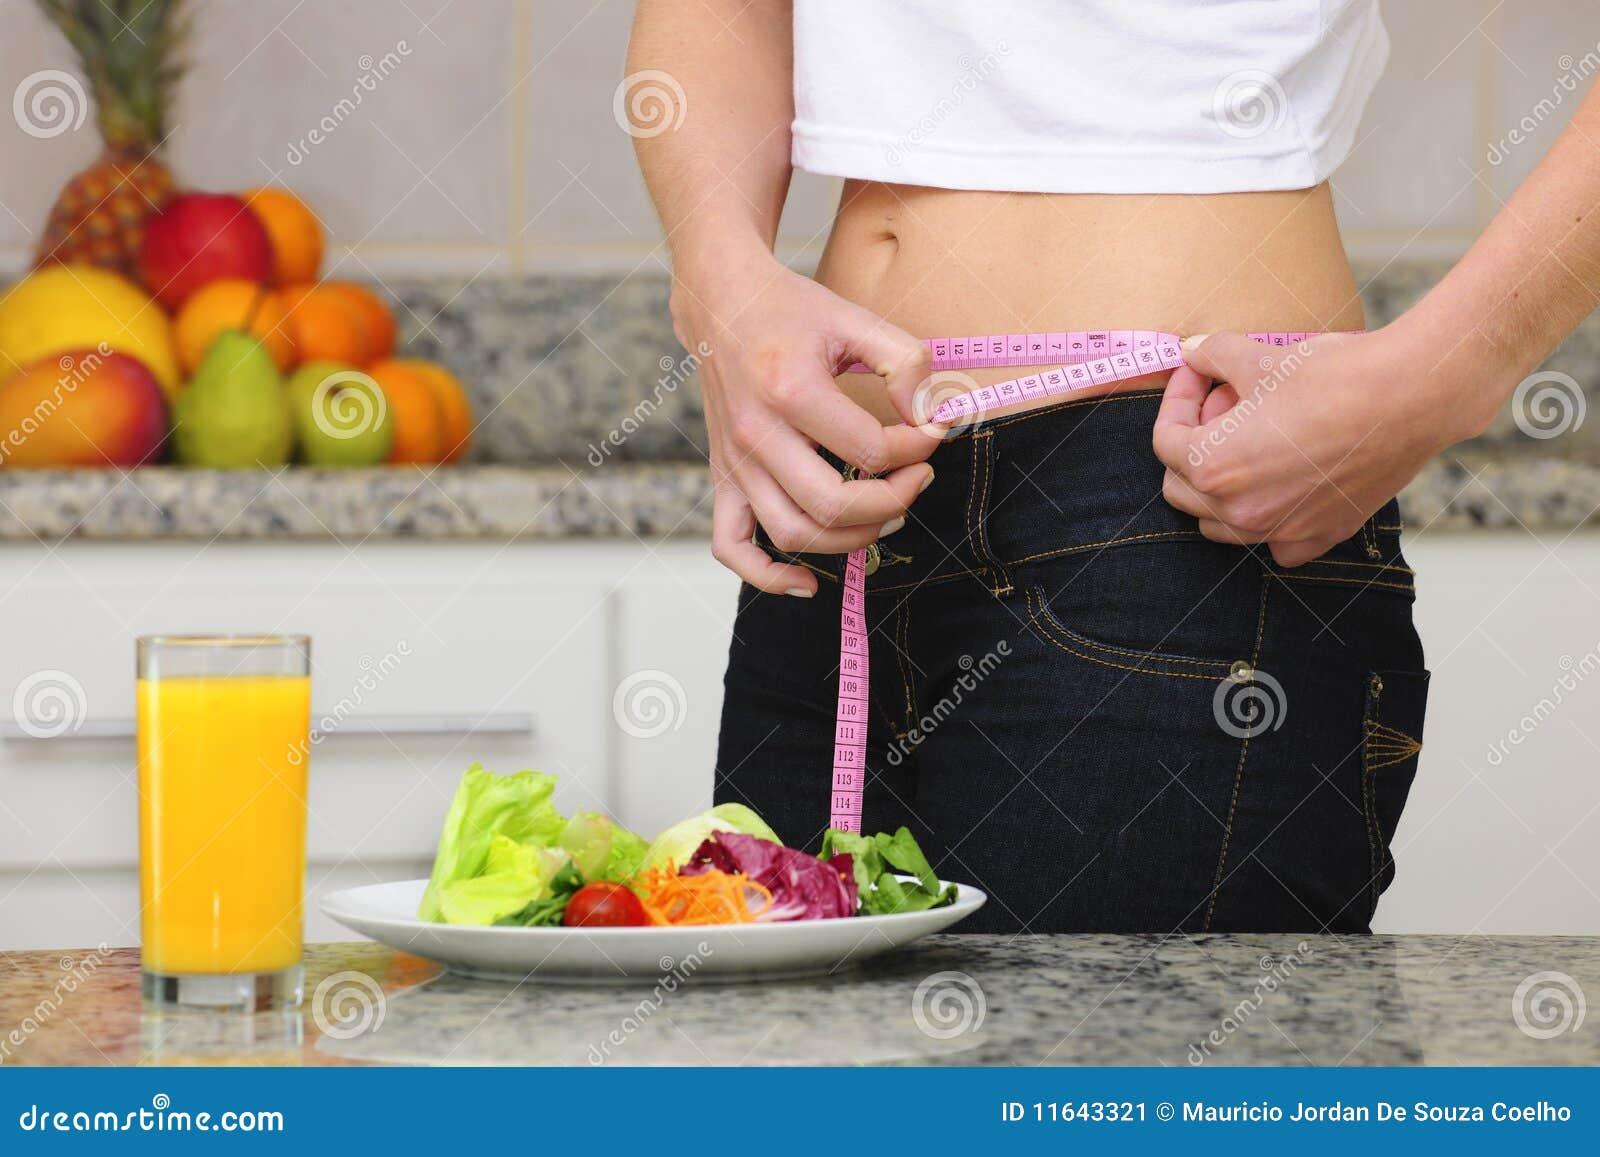 Fertility Diet, food and Infertility Preganancy Foods